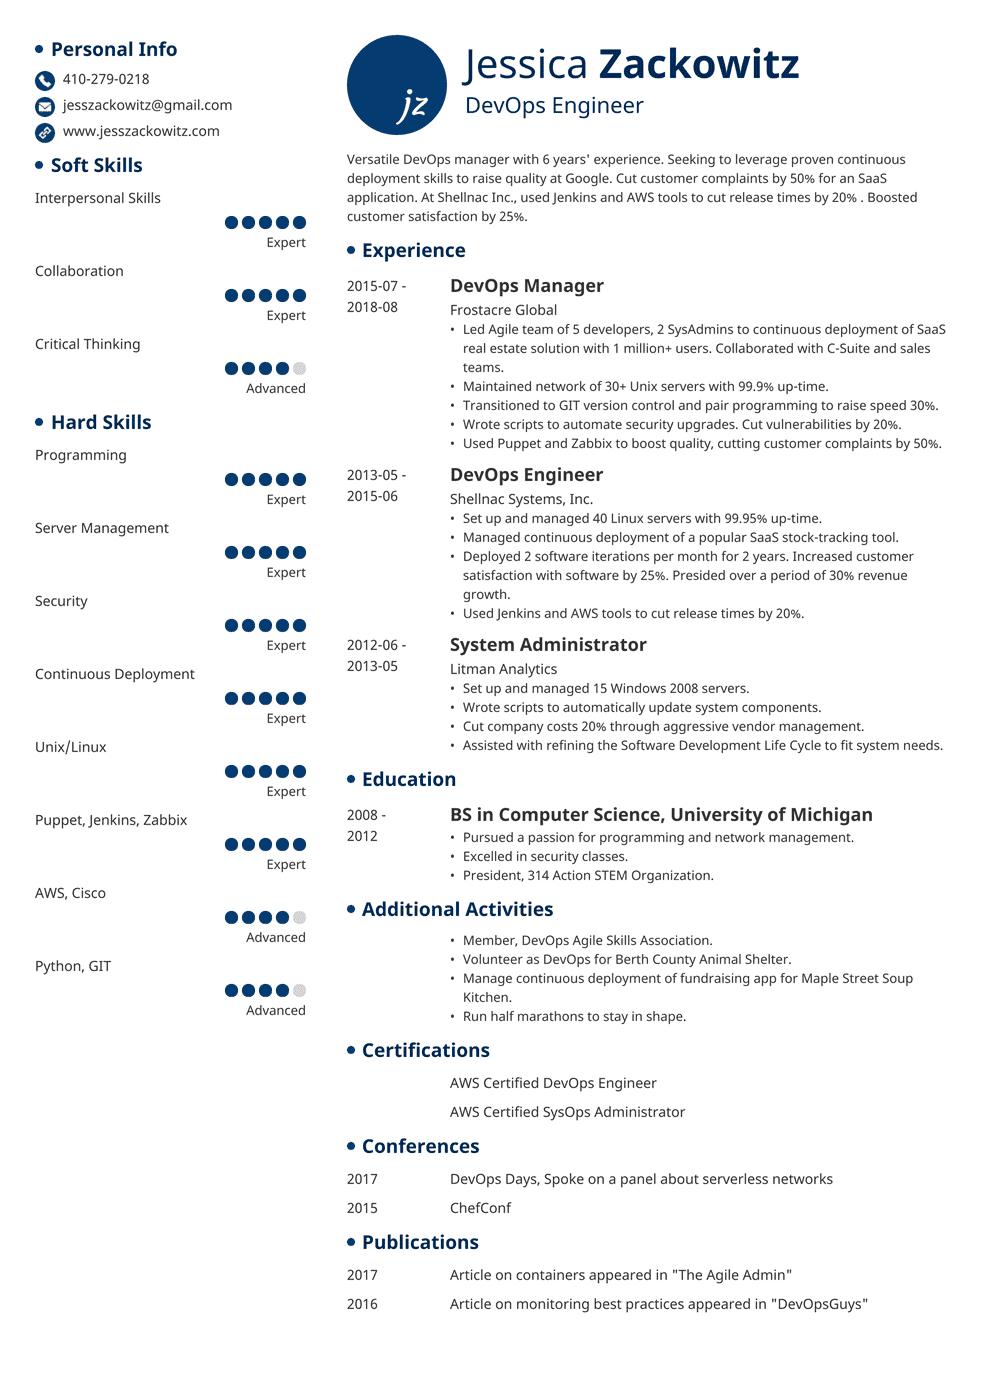 devops resume template initials in 2020 Resume examples